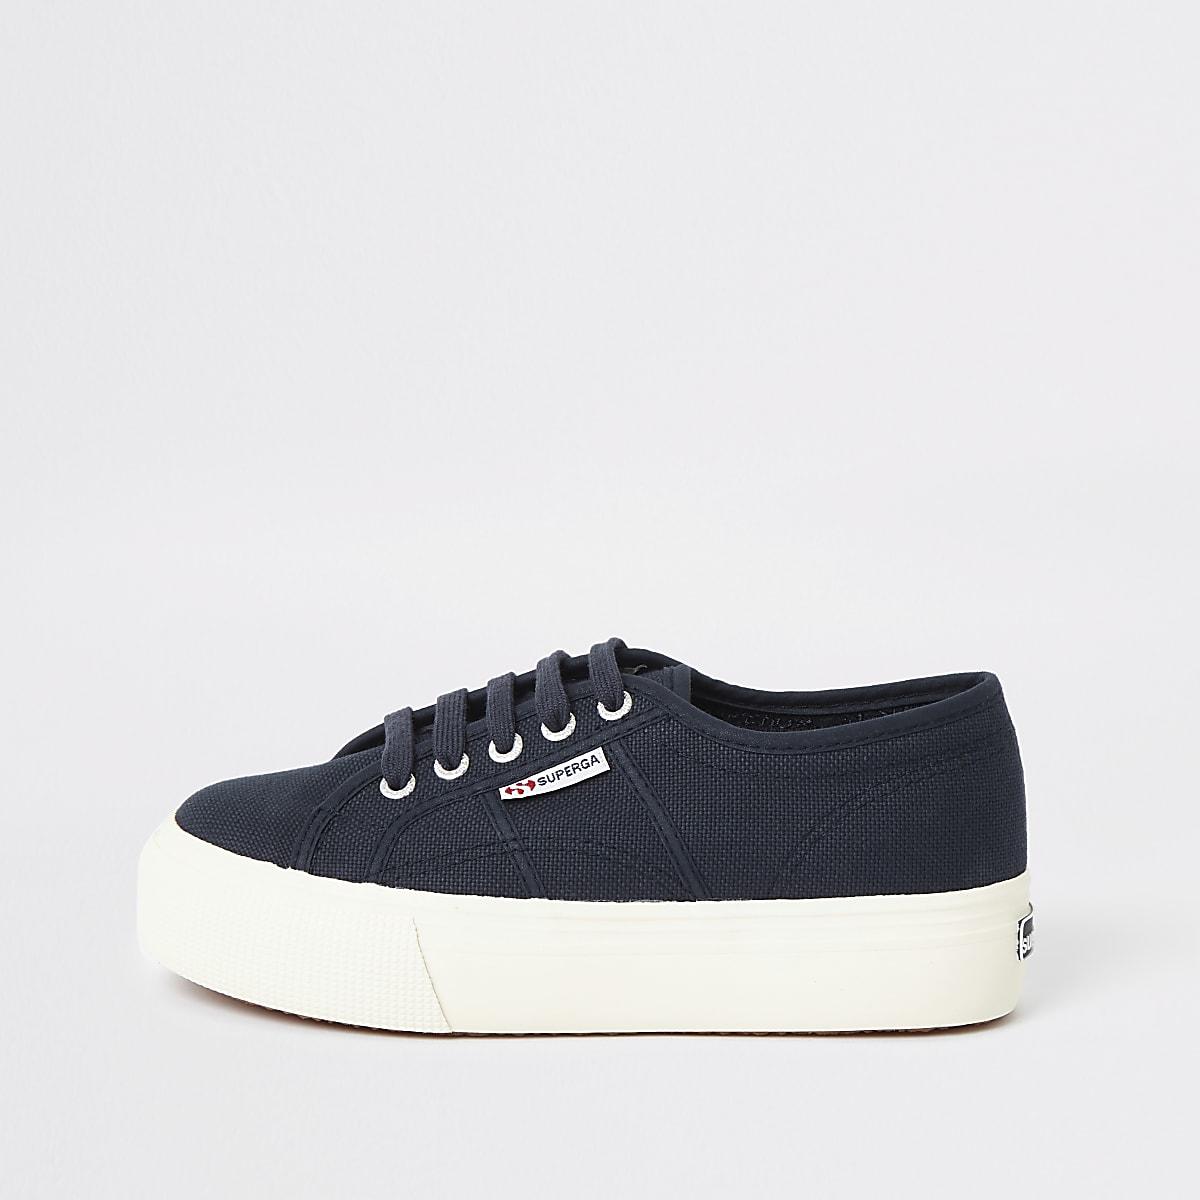 Superga navy flatform runner sneakers